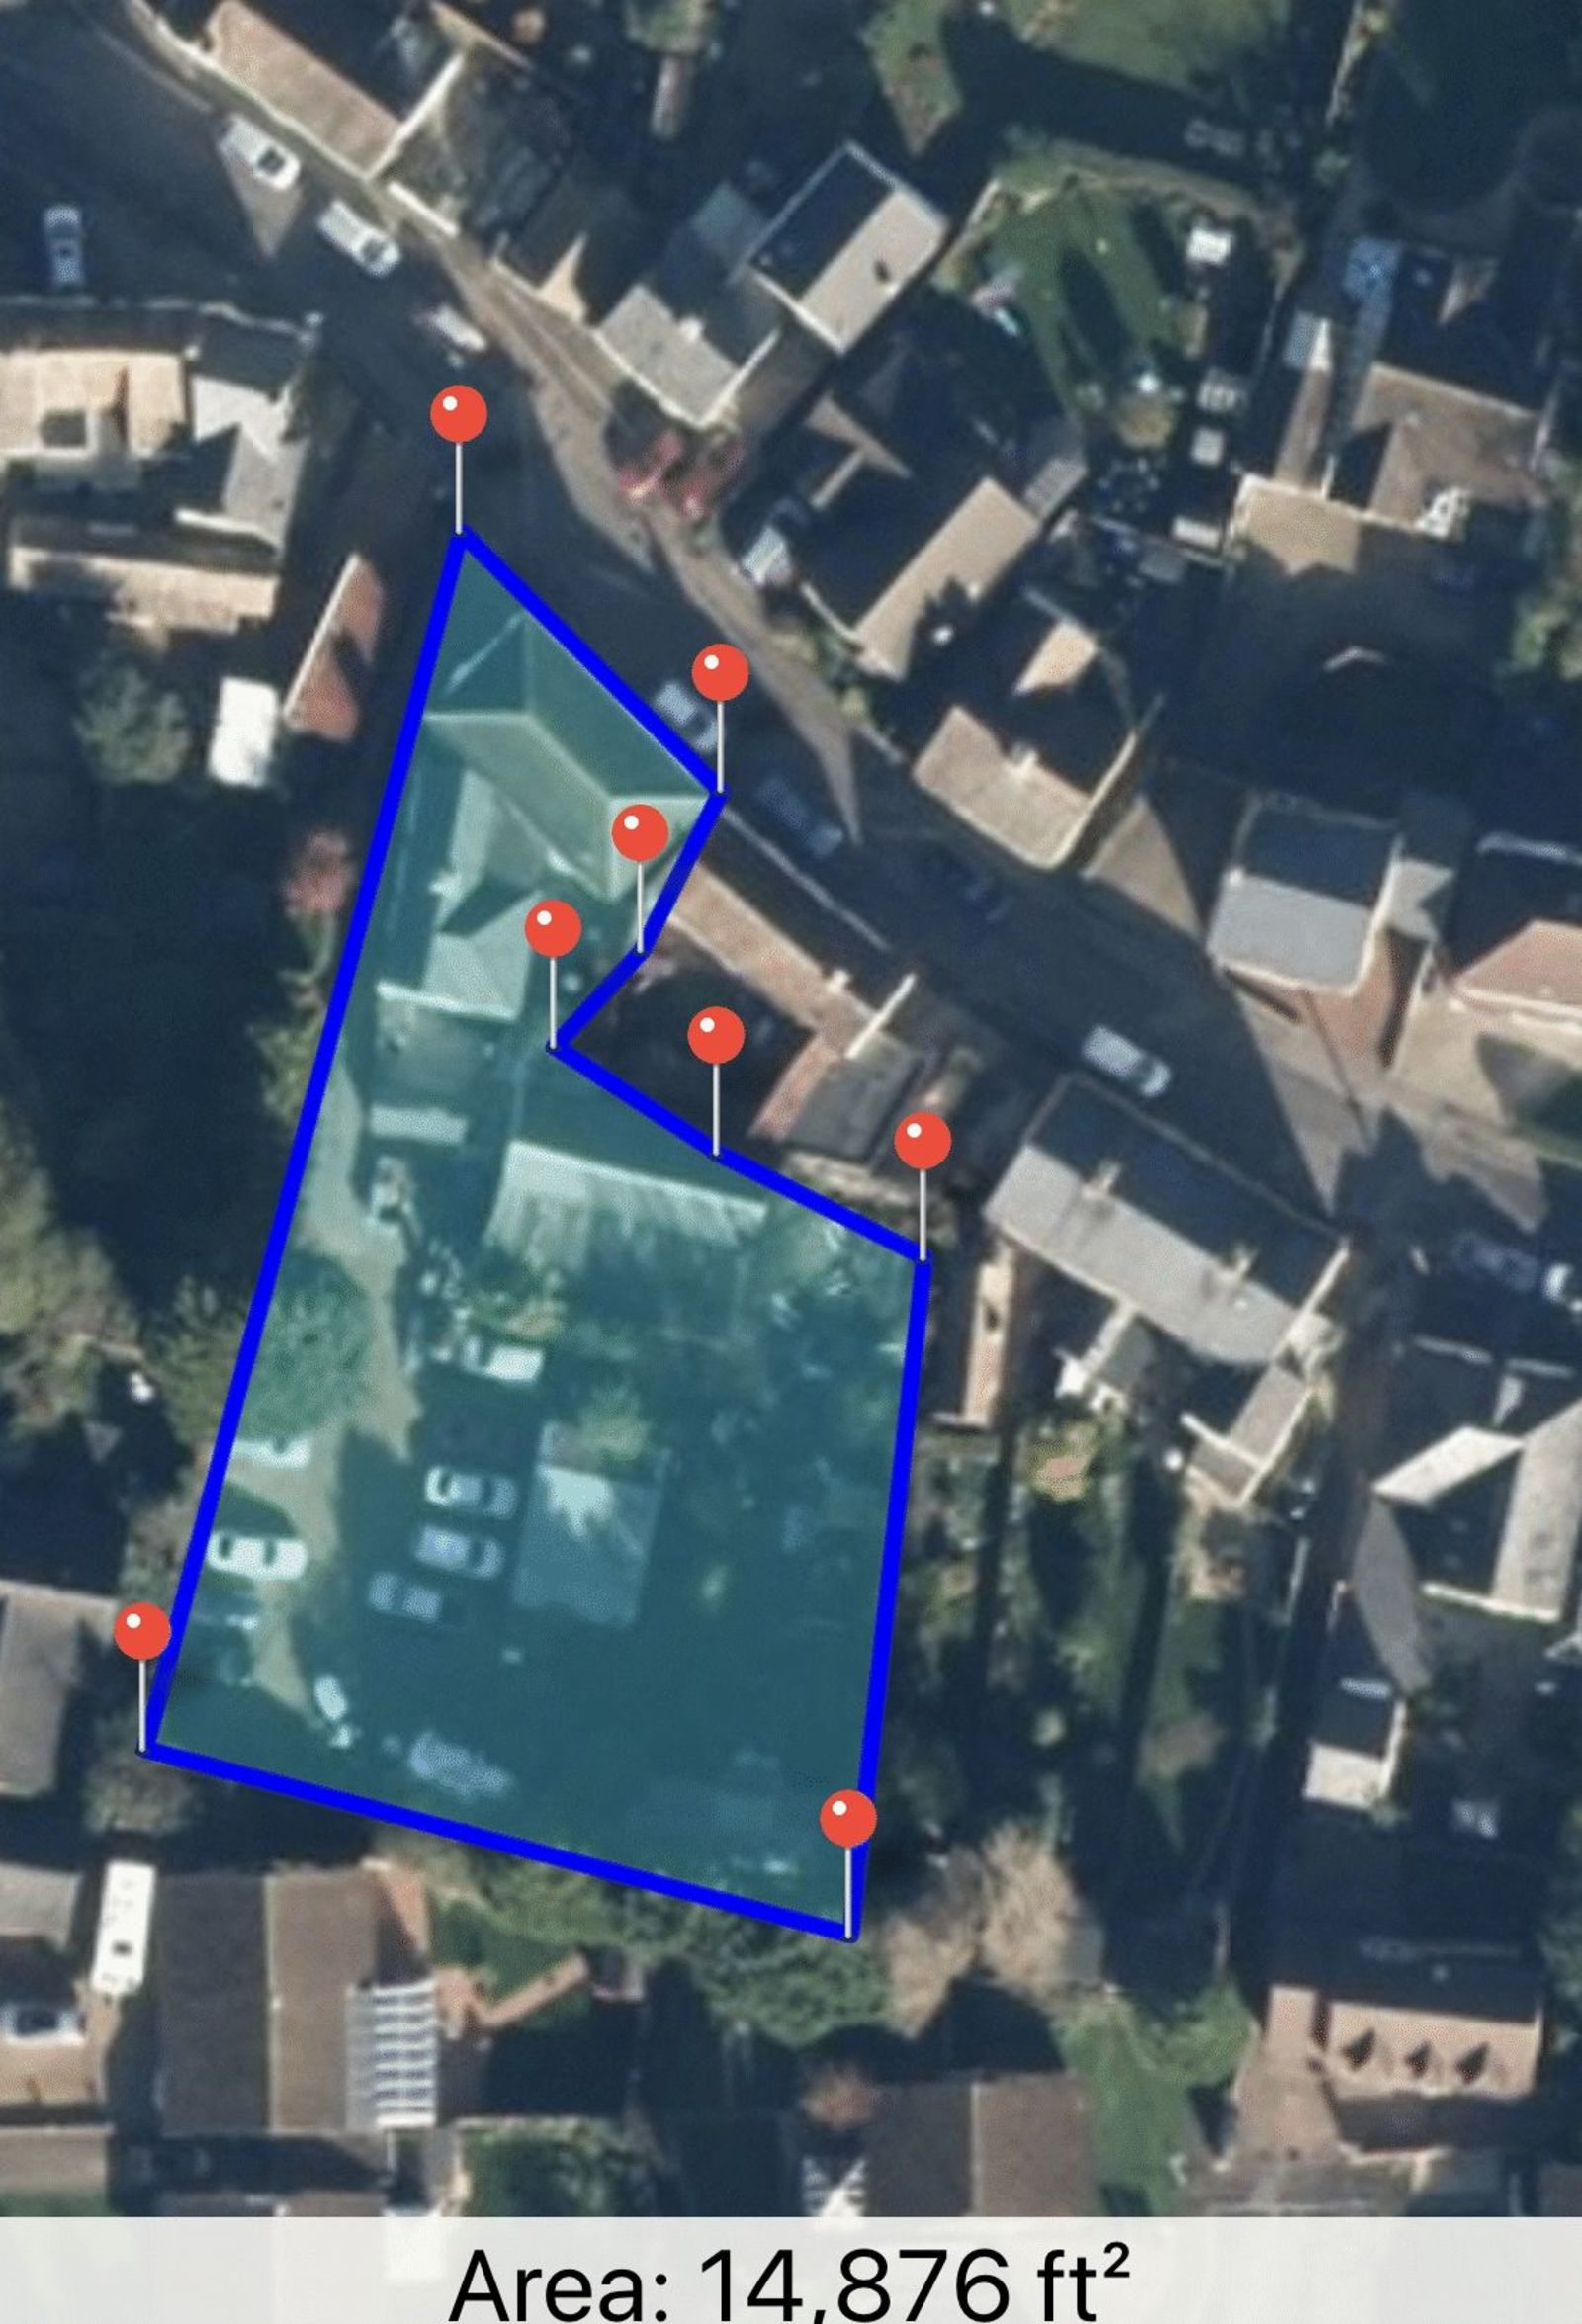 House for sale in Eaton Socon, Ackerman Street, PE19 8HR  - Property Image 1